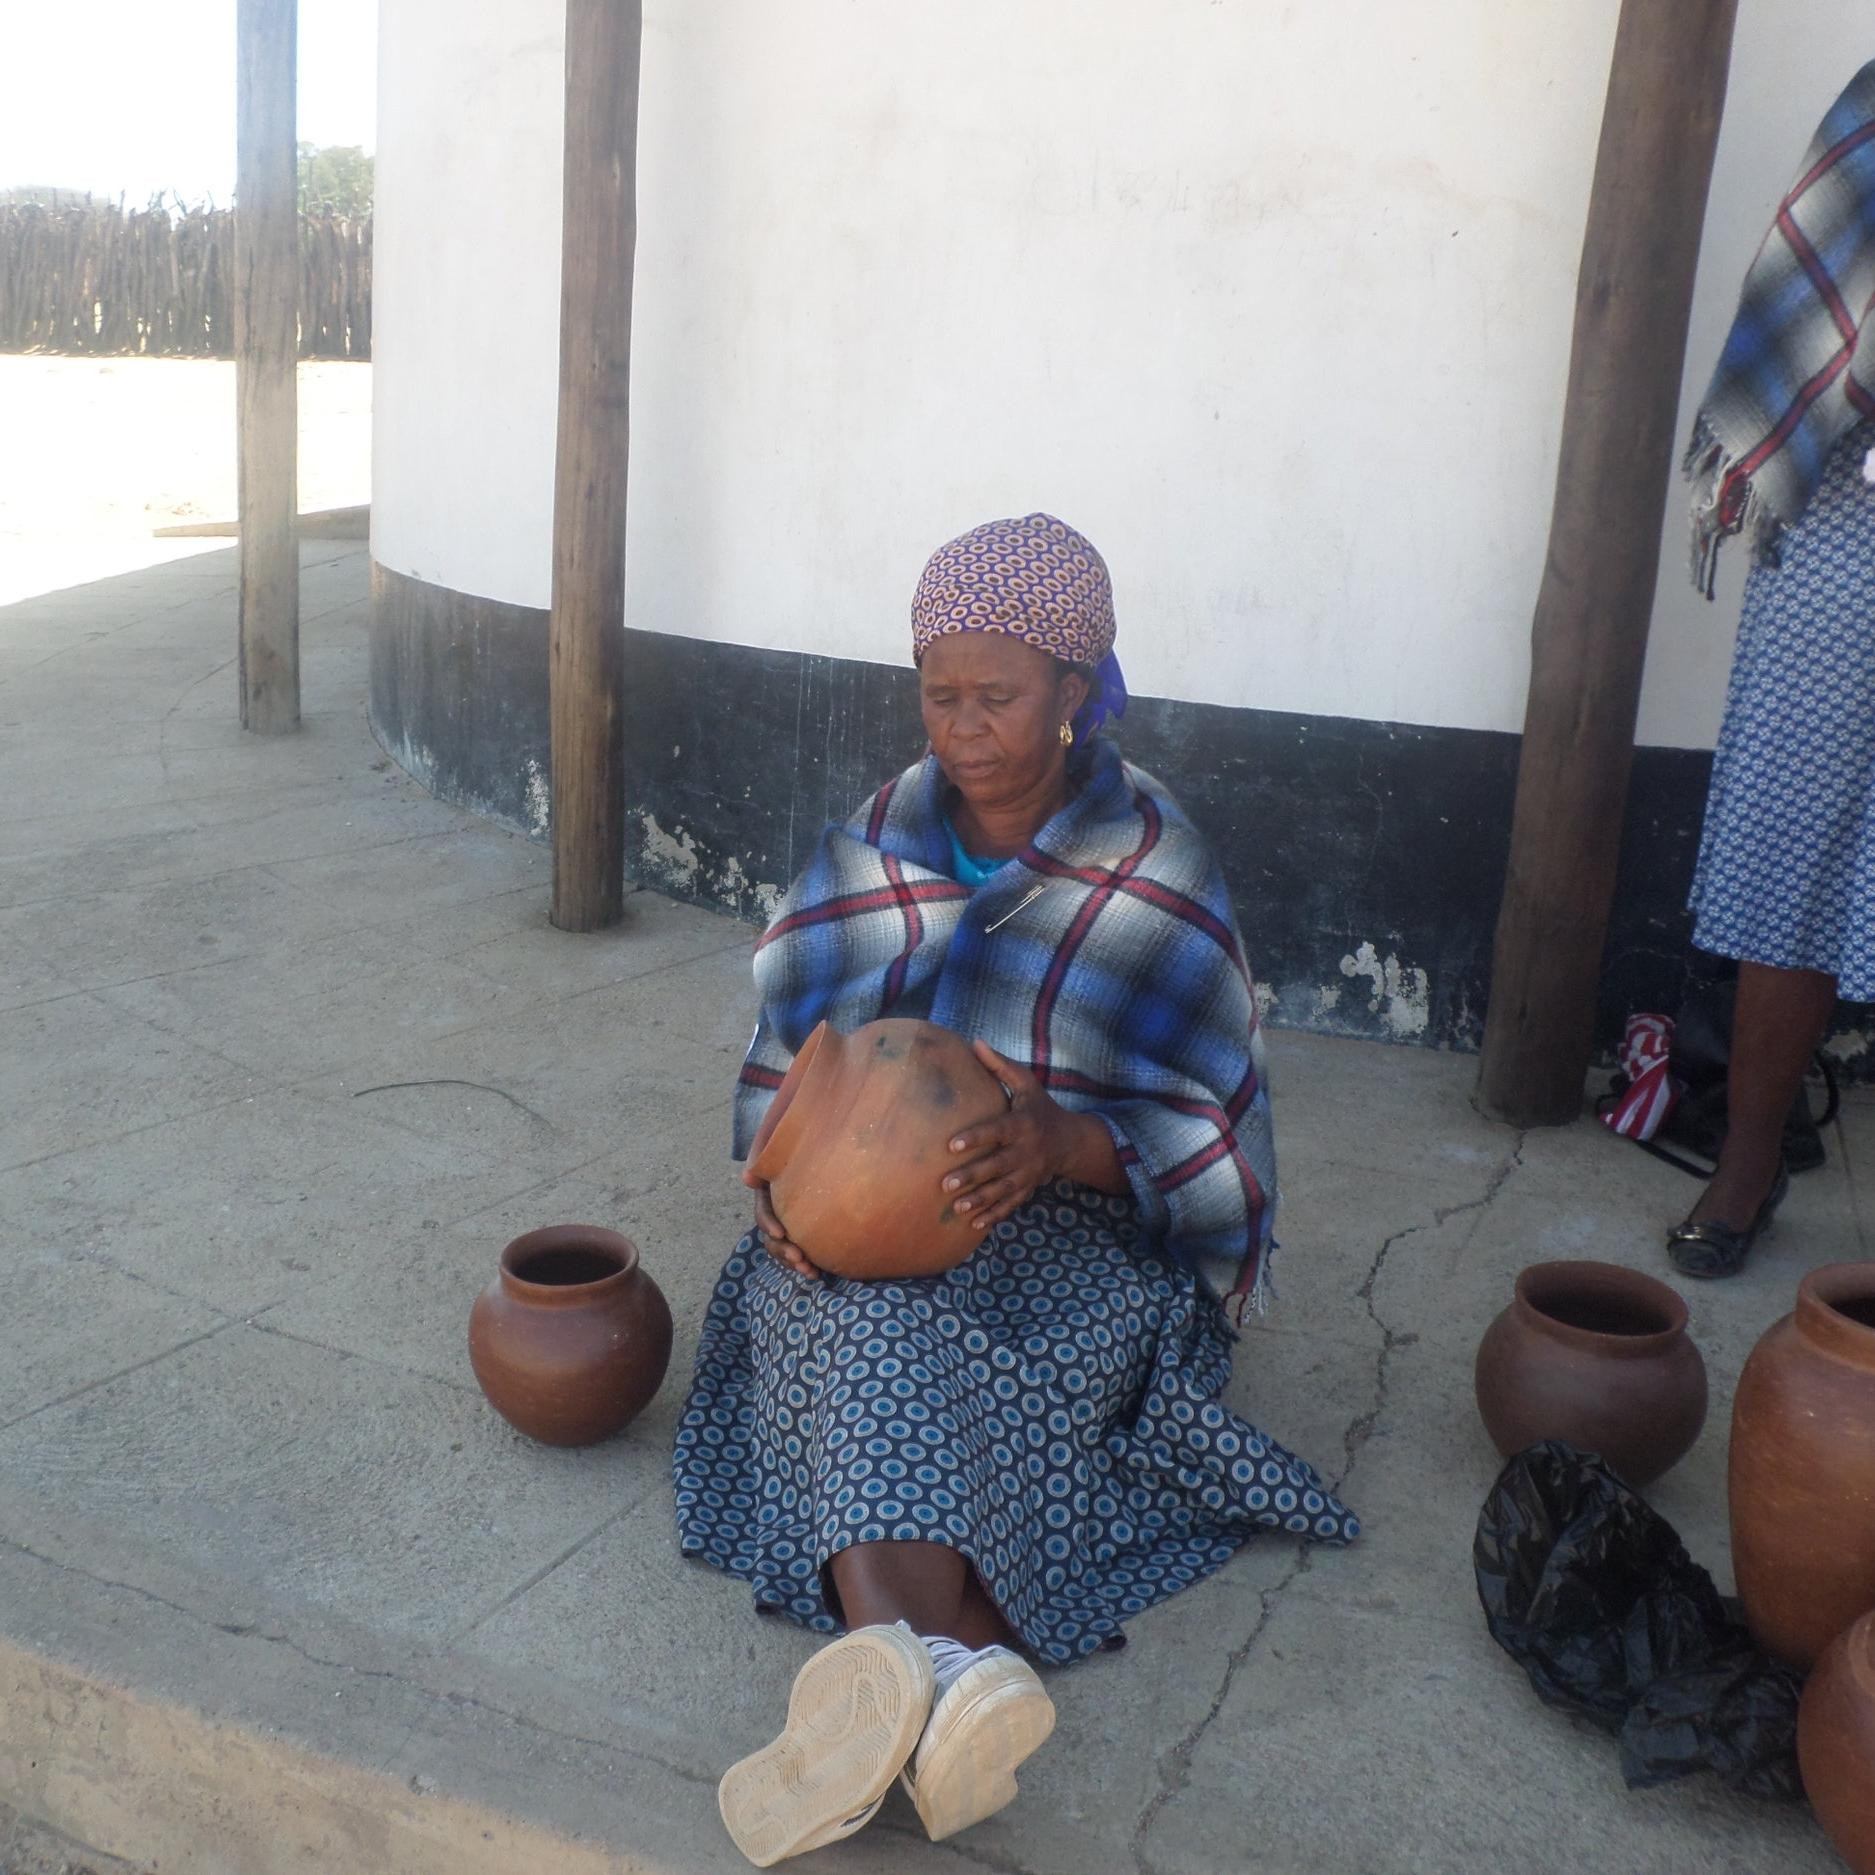 Lesego Thoane - Service Description∙ PotteryOpening Hours:Monday - Friday: Saturday: Sunday:Directions:WardContact:📞 (+267) 72 85 47 29✎ @